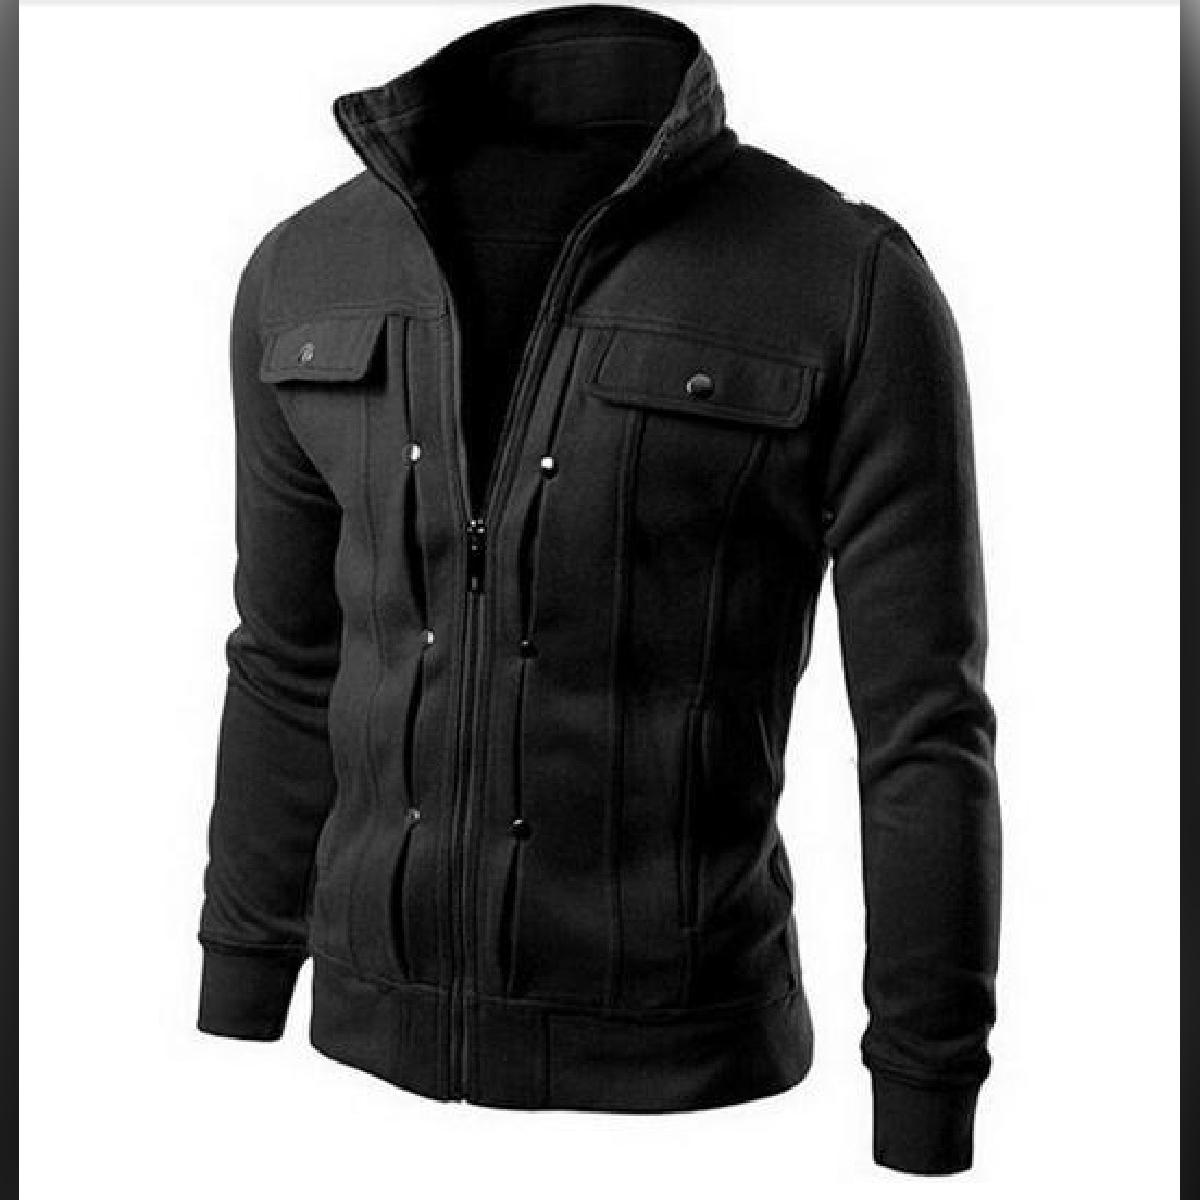 Fashion 2020 Designer Fleece Winter Zipper Casual Stylish Mock Neck and Hooded Full Sleeves Jacket for Men